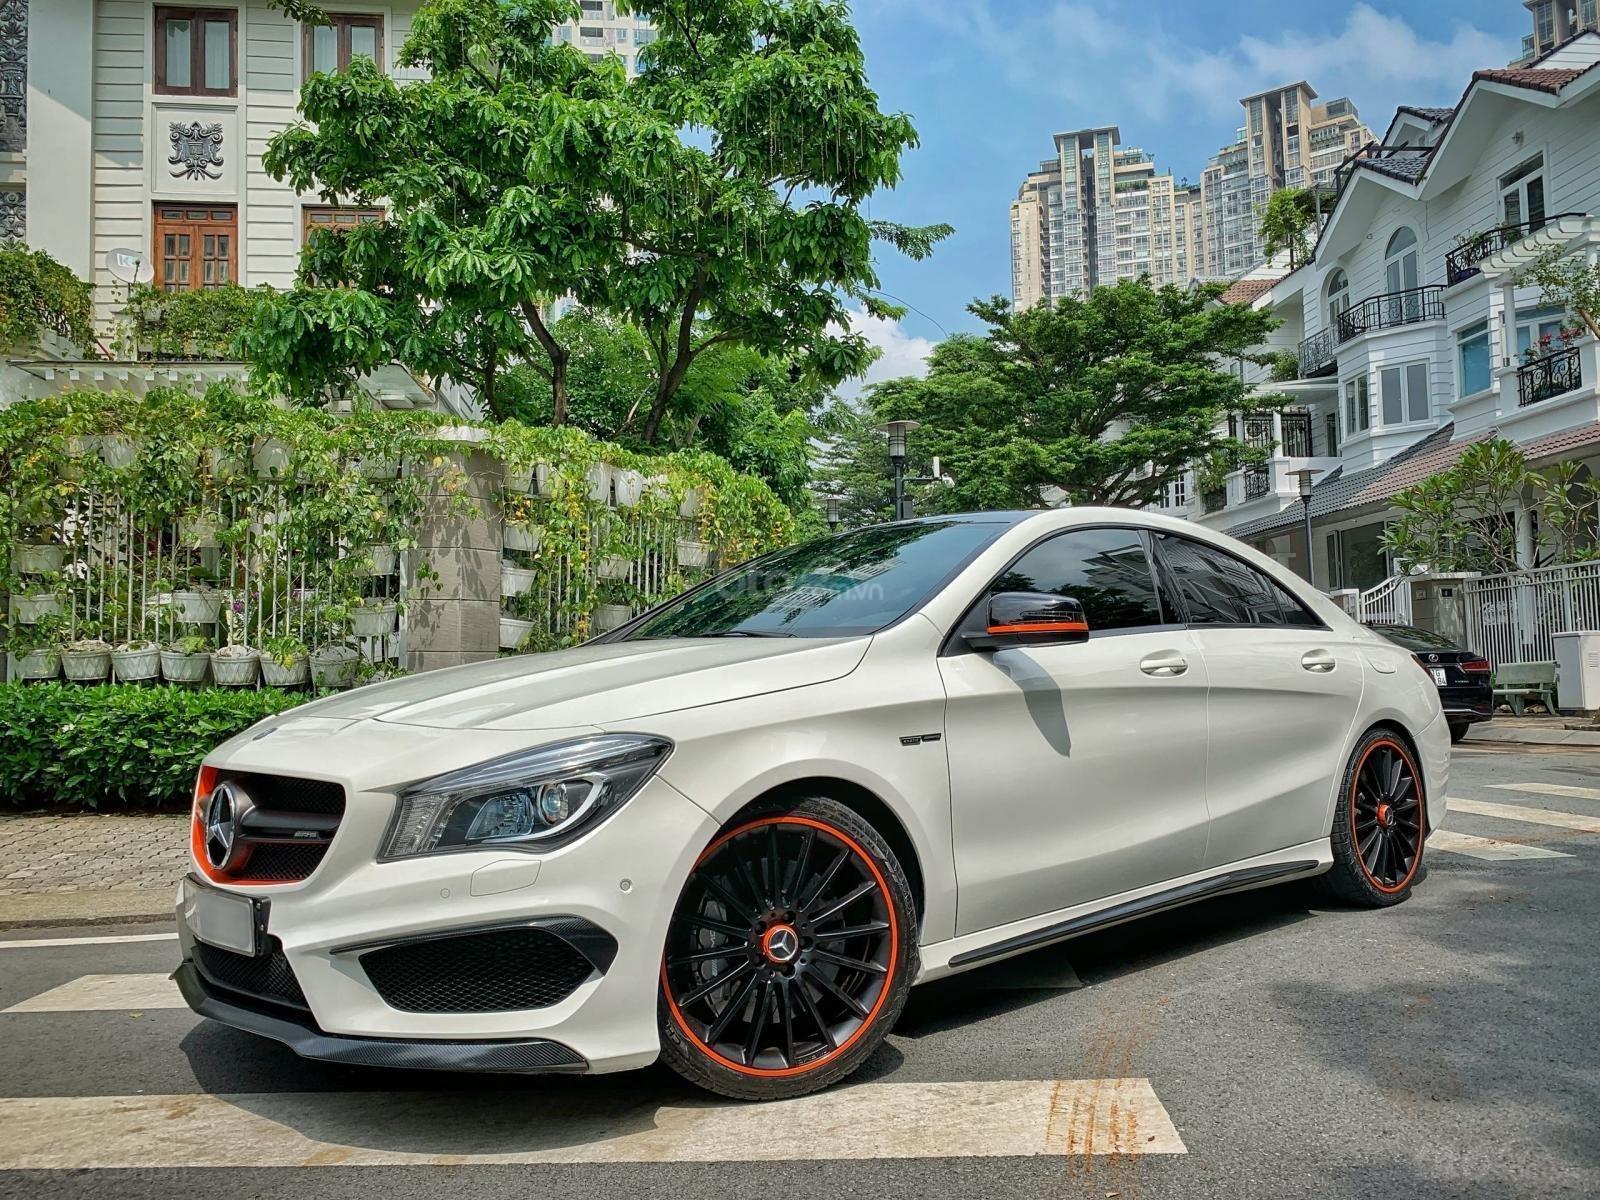 Bán xe Mercedes CLA 45AMG Orange Art đời 2016 full option, giá chỉ 1 tỷ 65 (4)